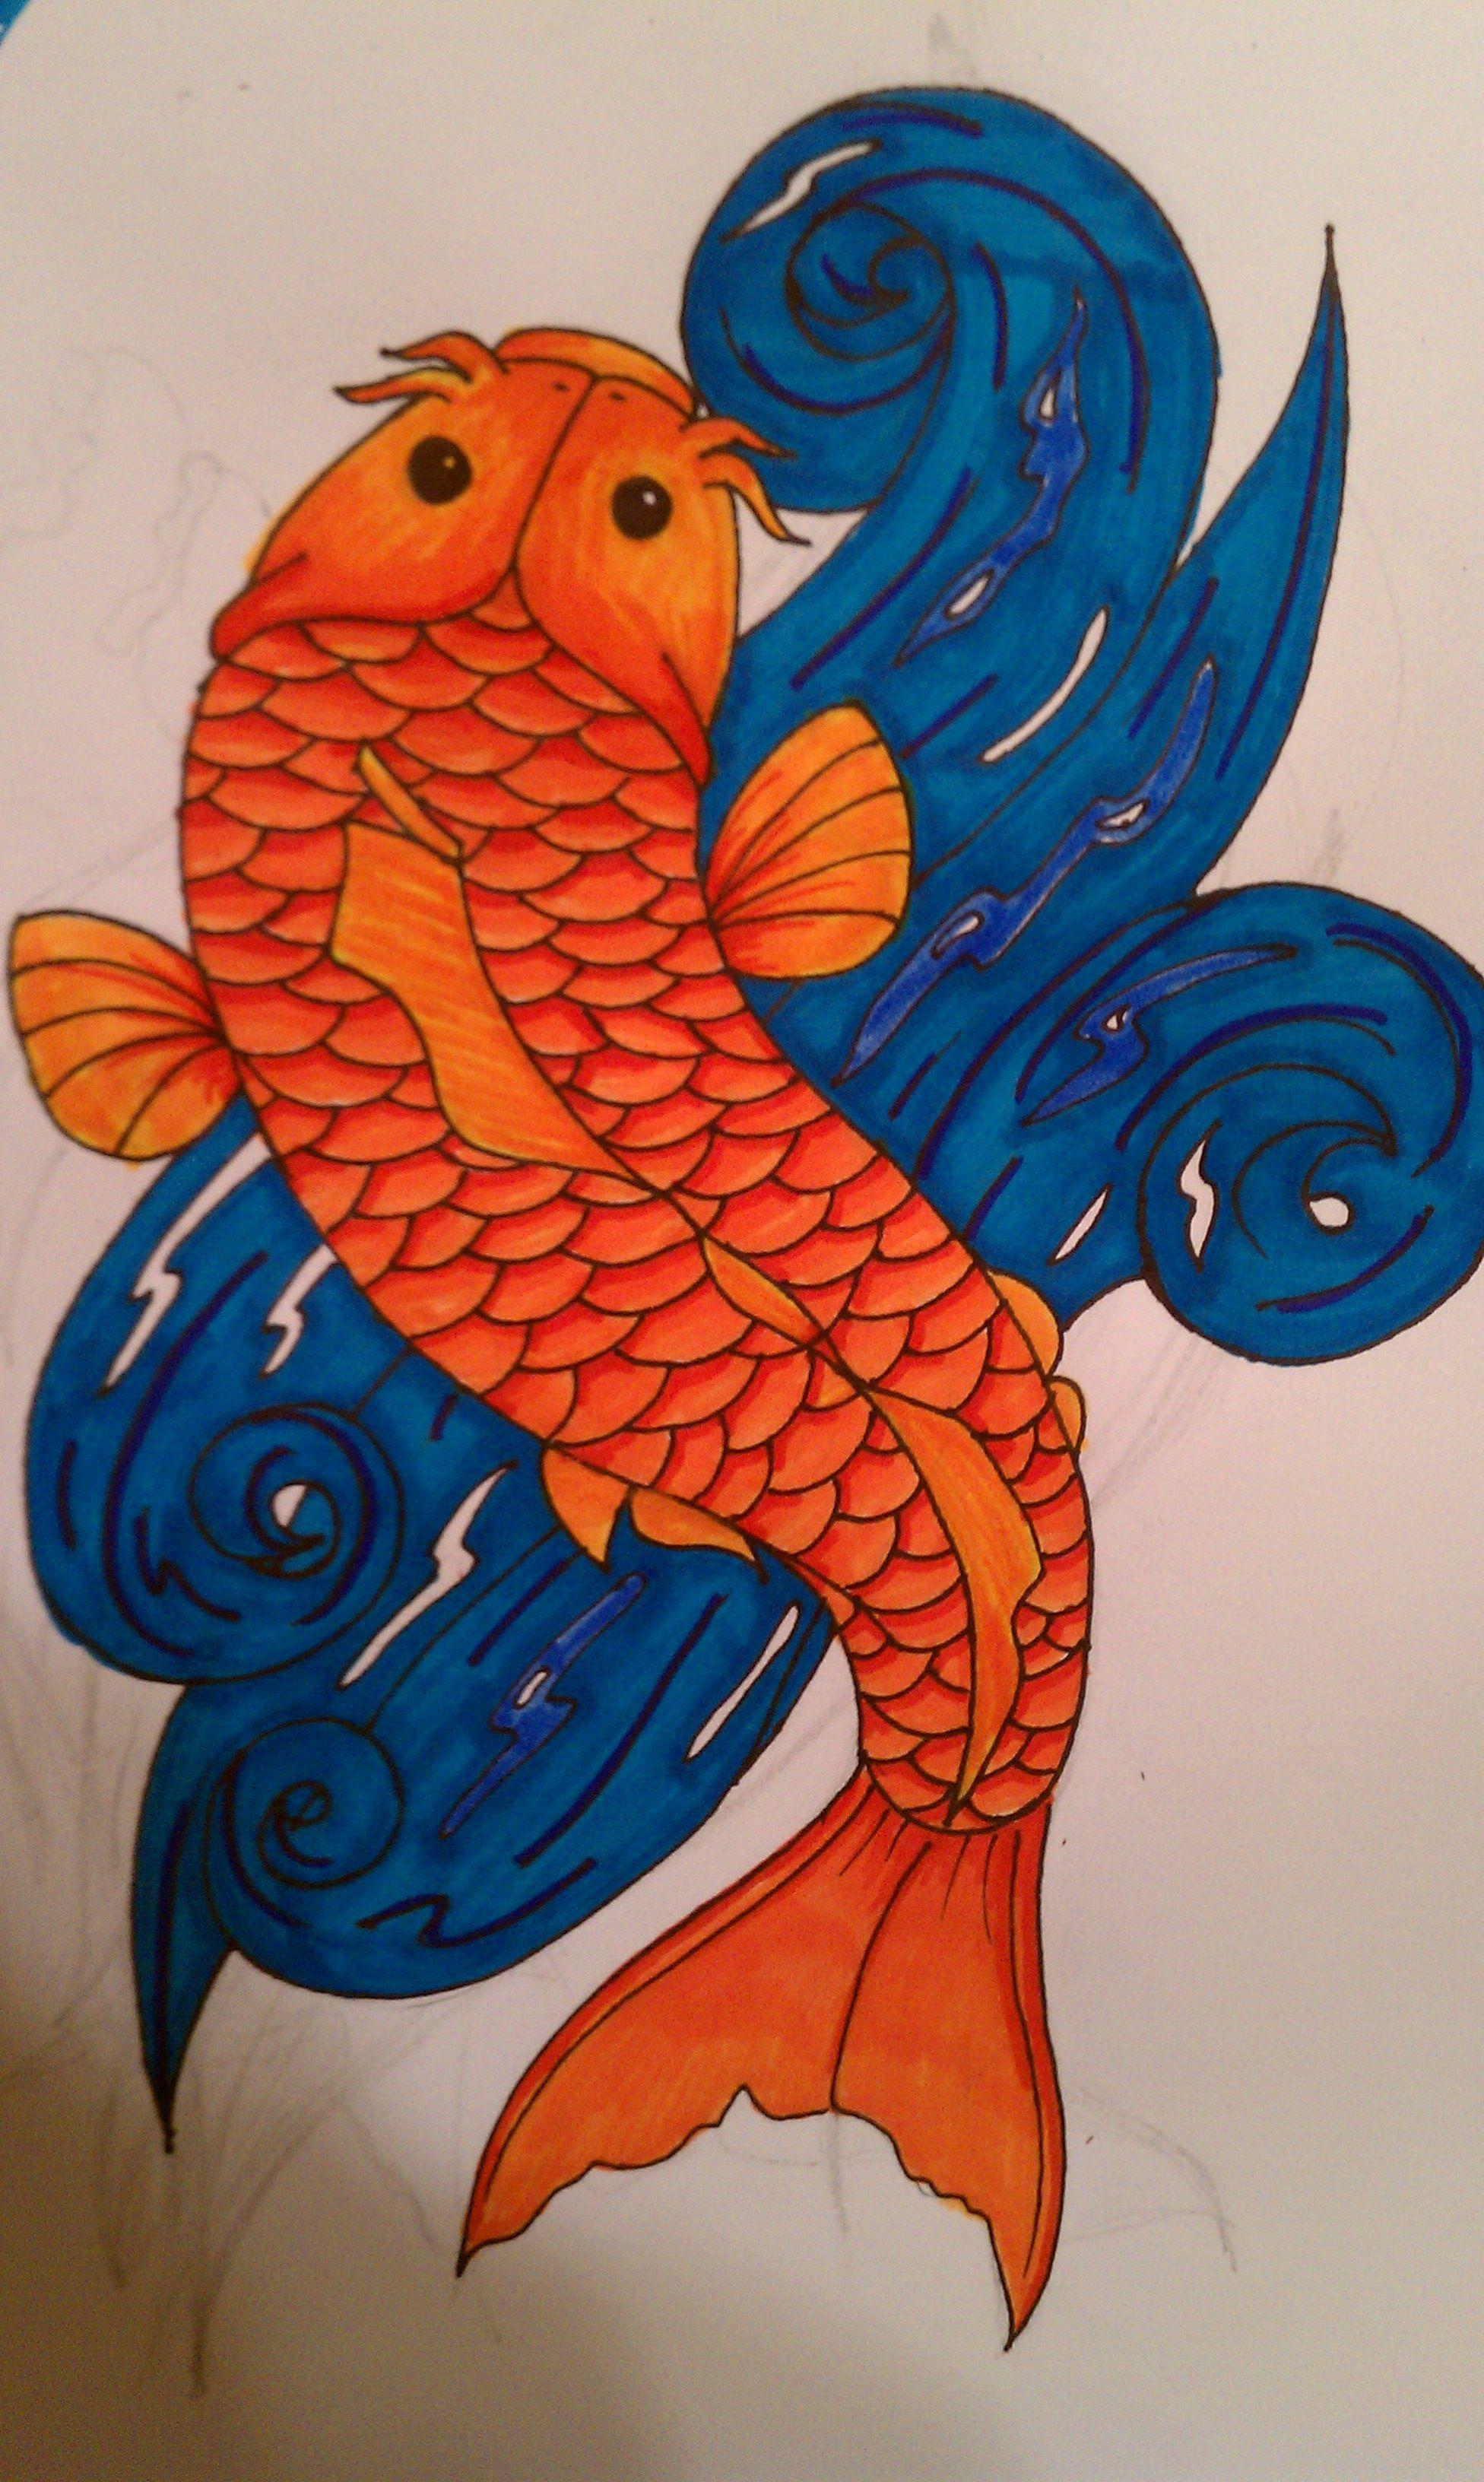 Pin by Adonna Disbrow on My Tattoos | Pinterest | Koi